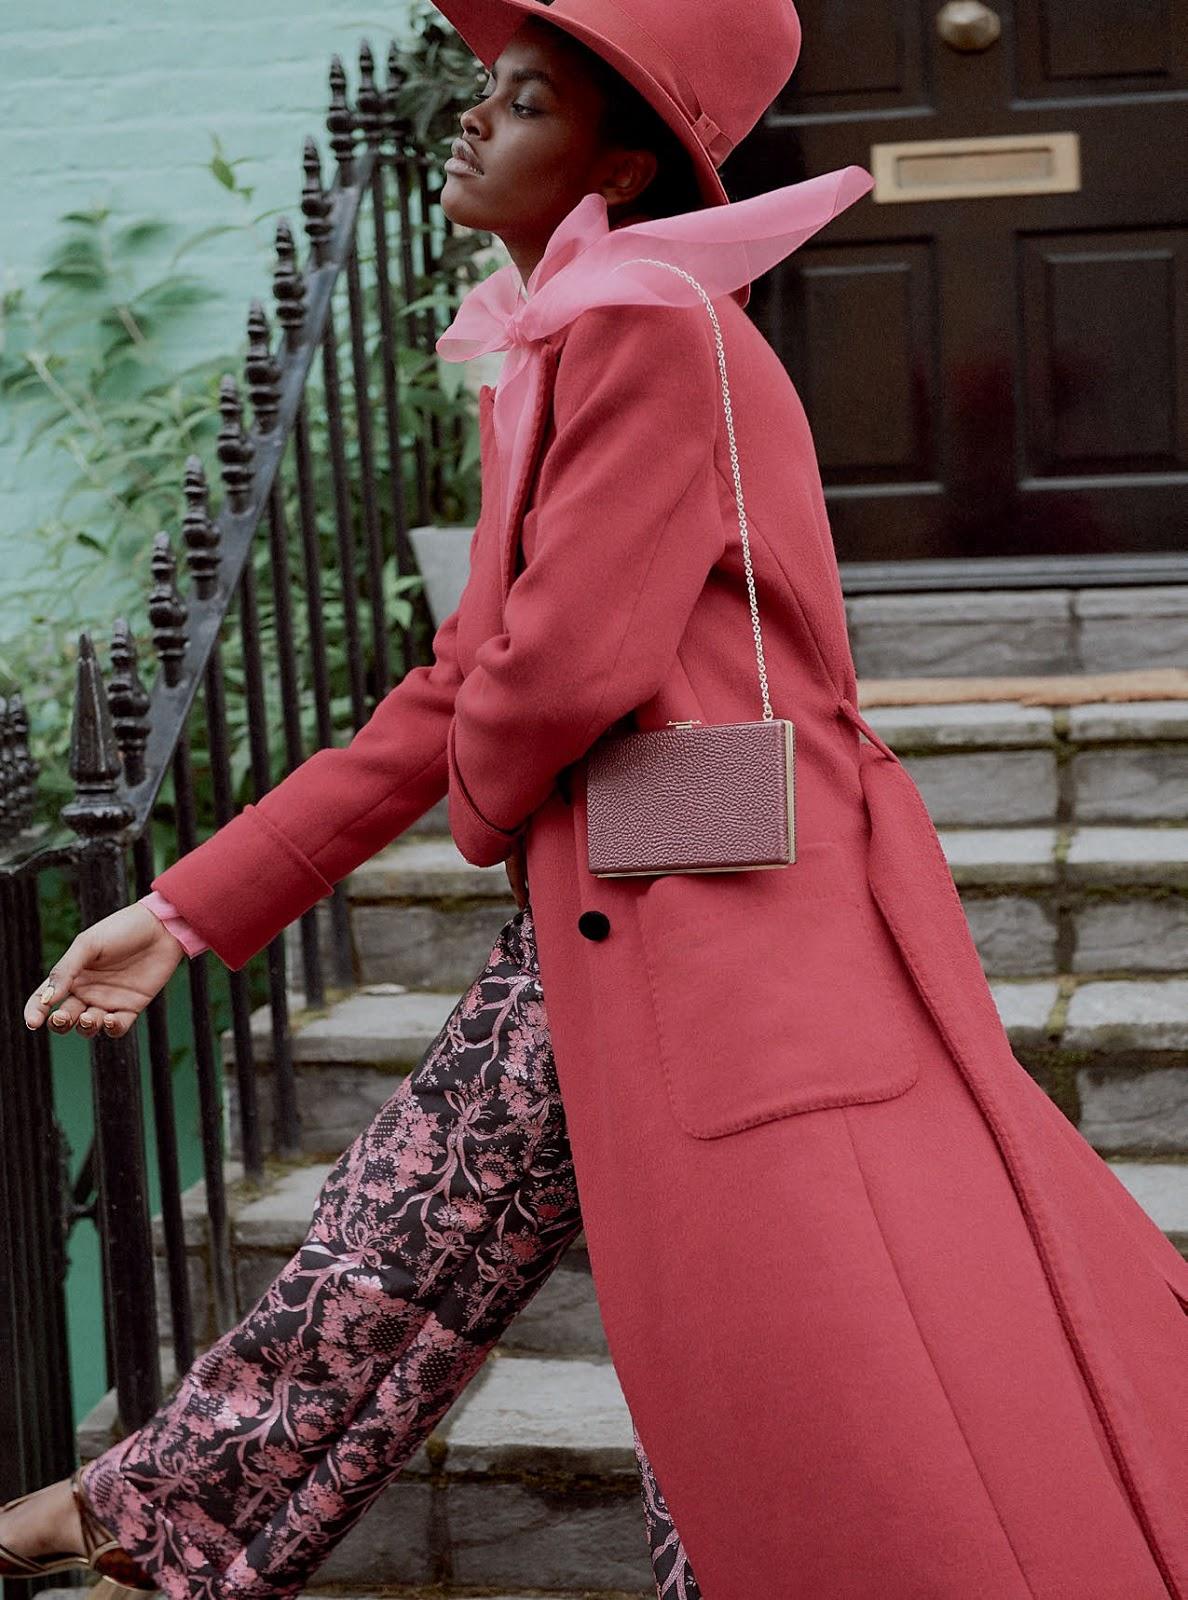 Amilna Estevao by Regan Cameron for Harper's Bazaar UK Sept 2019 (14).jpg